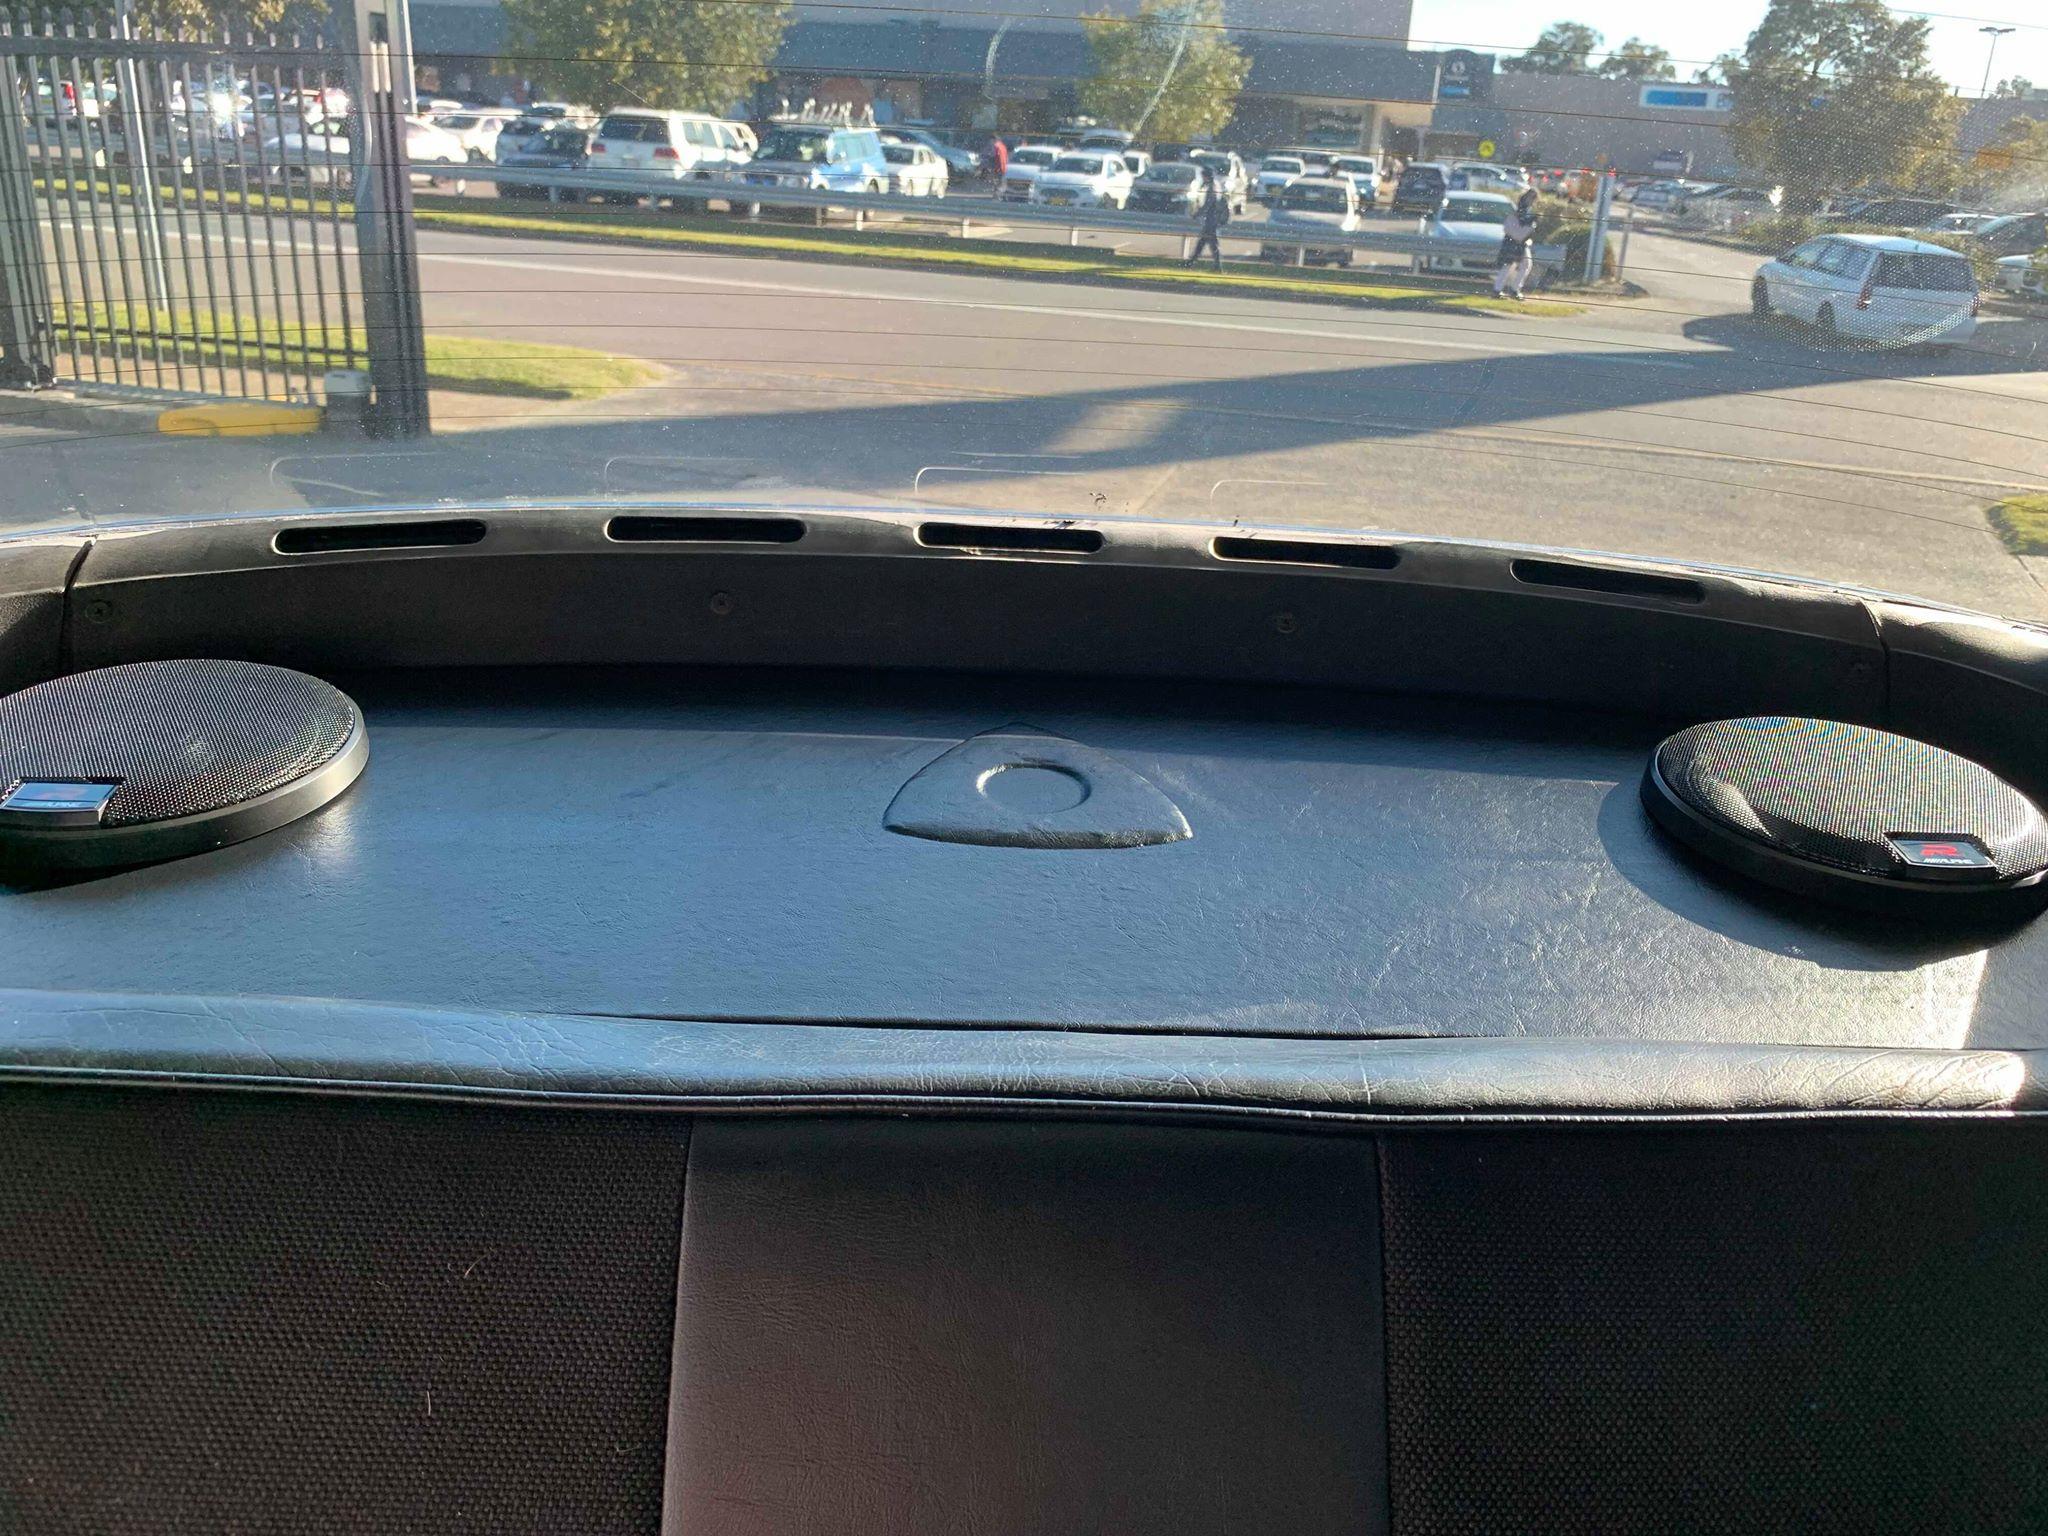 Mazda Capella - https://www.newcastleprosound.com.au/wp-content/uploads/2019/07/67594439_459644567924977_5685275650261254144_n.jpg